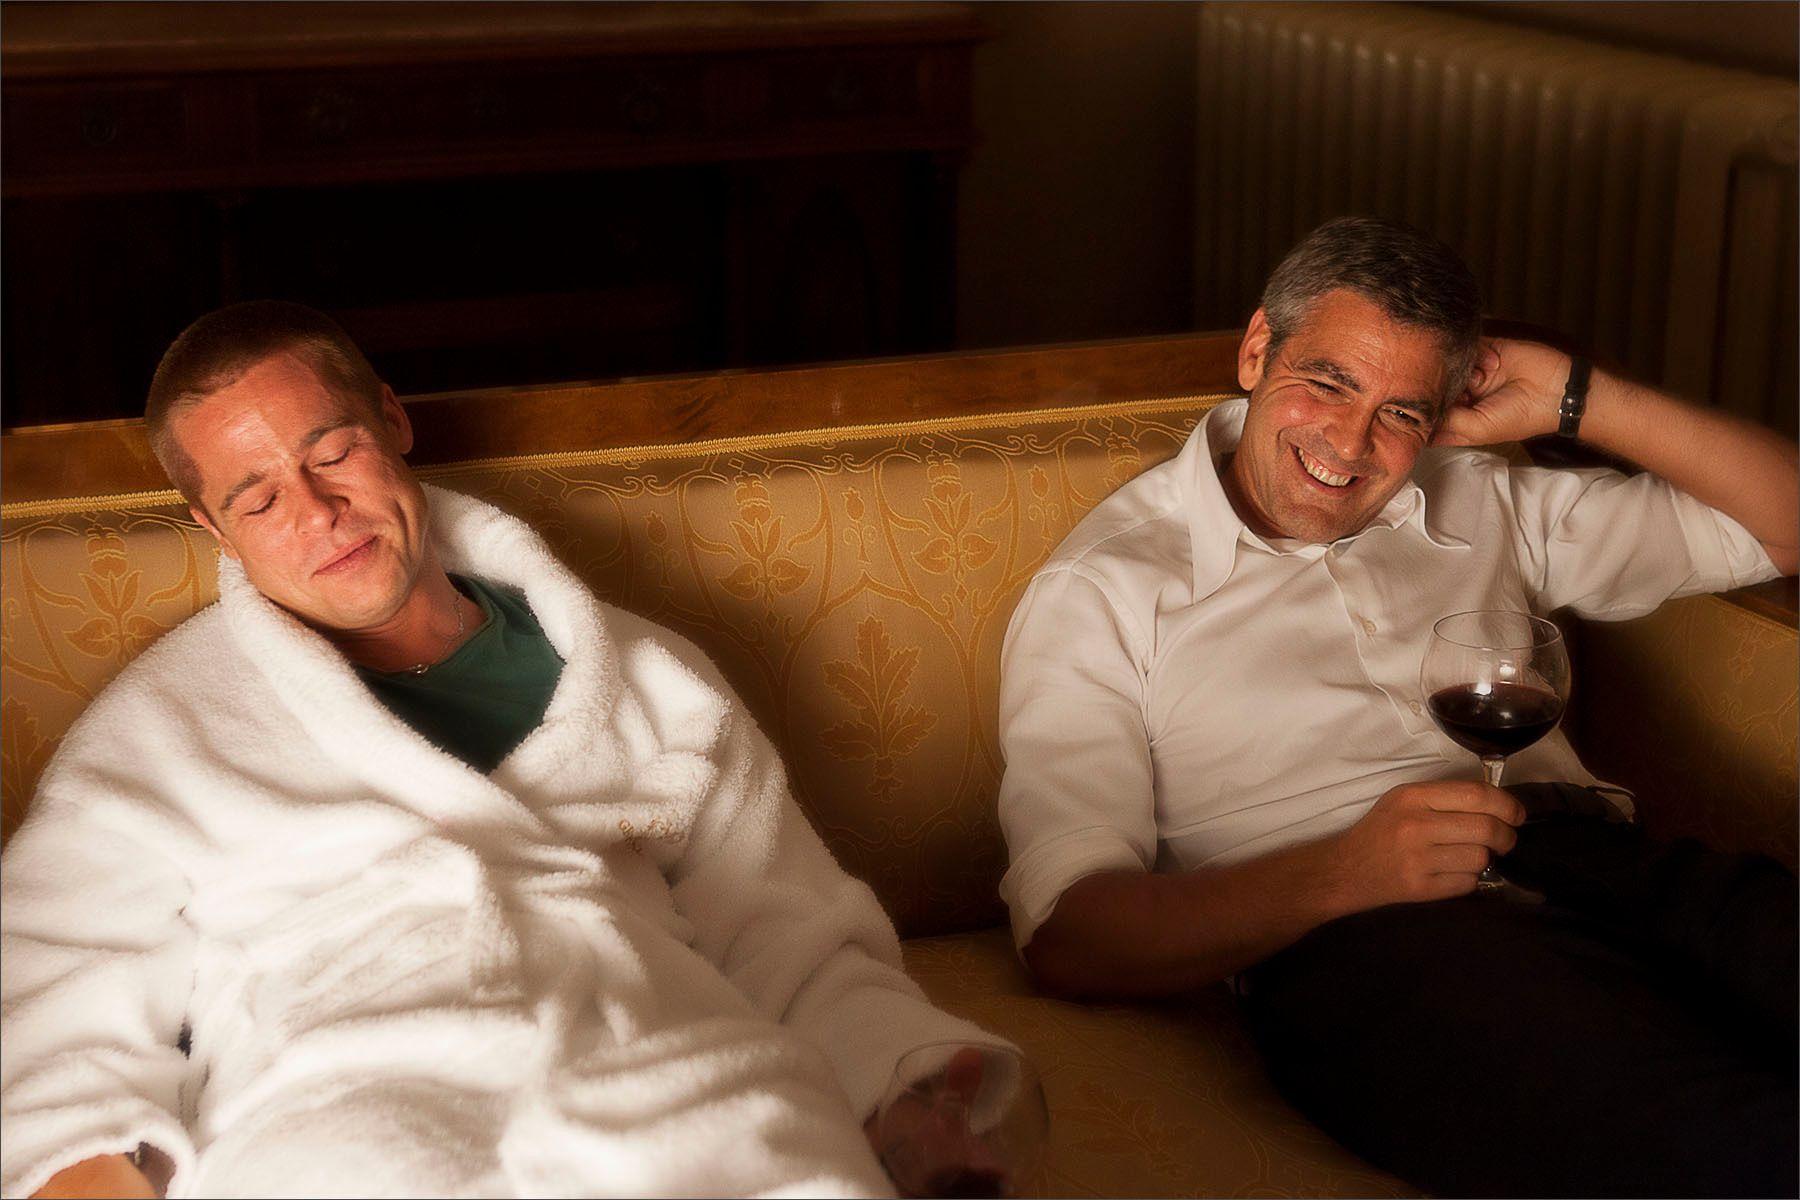 Brad Pitt & George Clooney - Ocean's Twelve